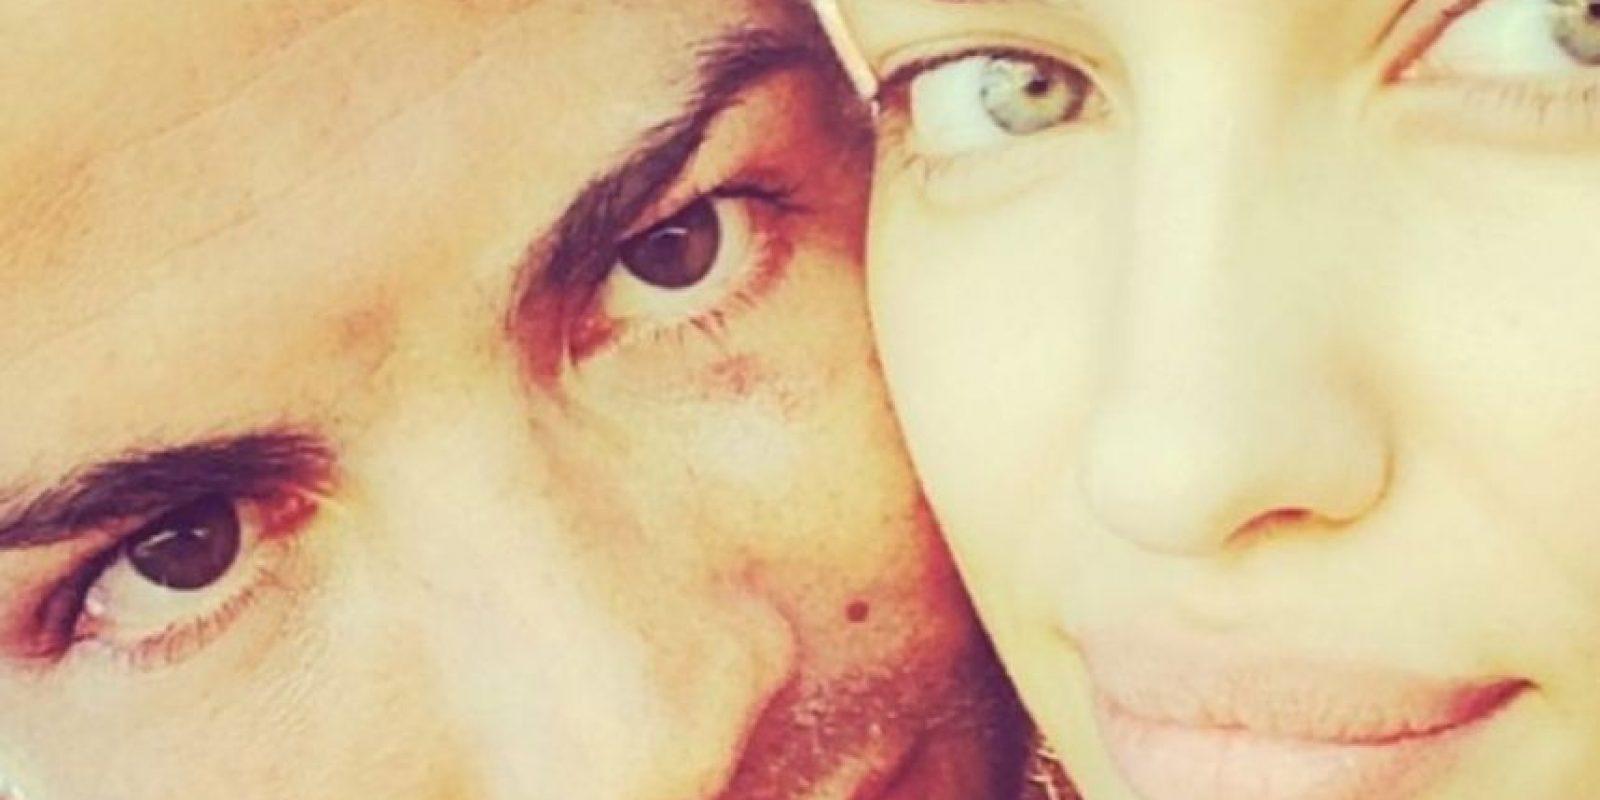 Cristiano Ronaldo e Irina Shayk se habrían separado antes de Año Nuevo. Foto:instagram.com/irinashayk